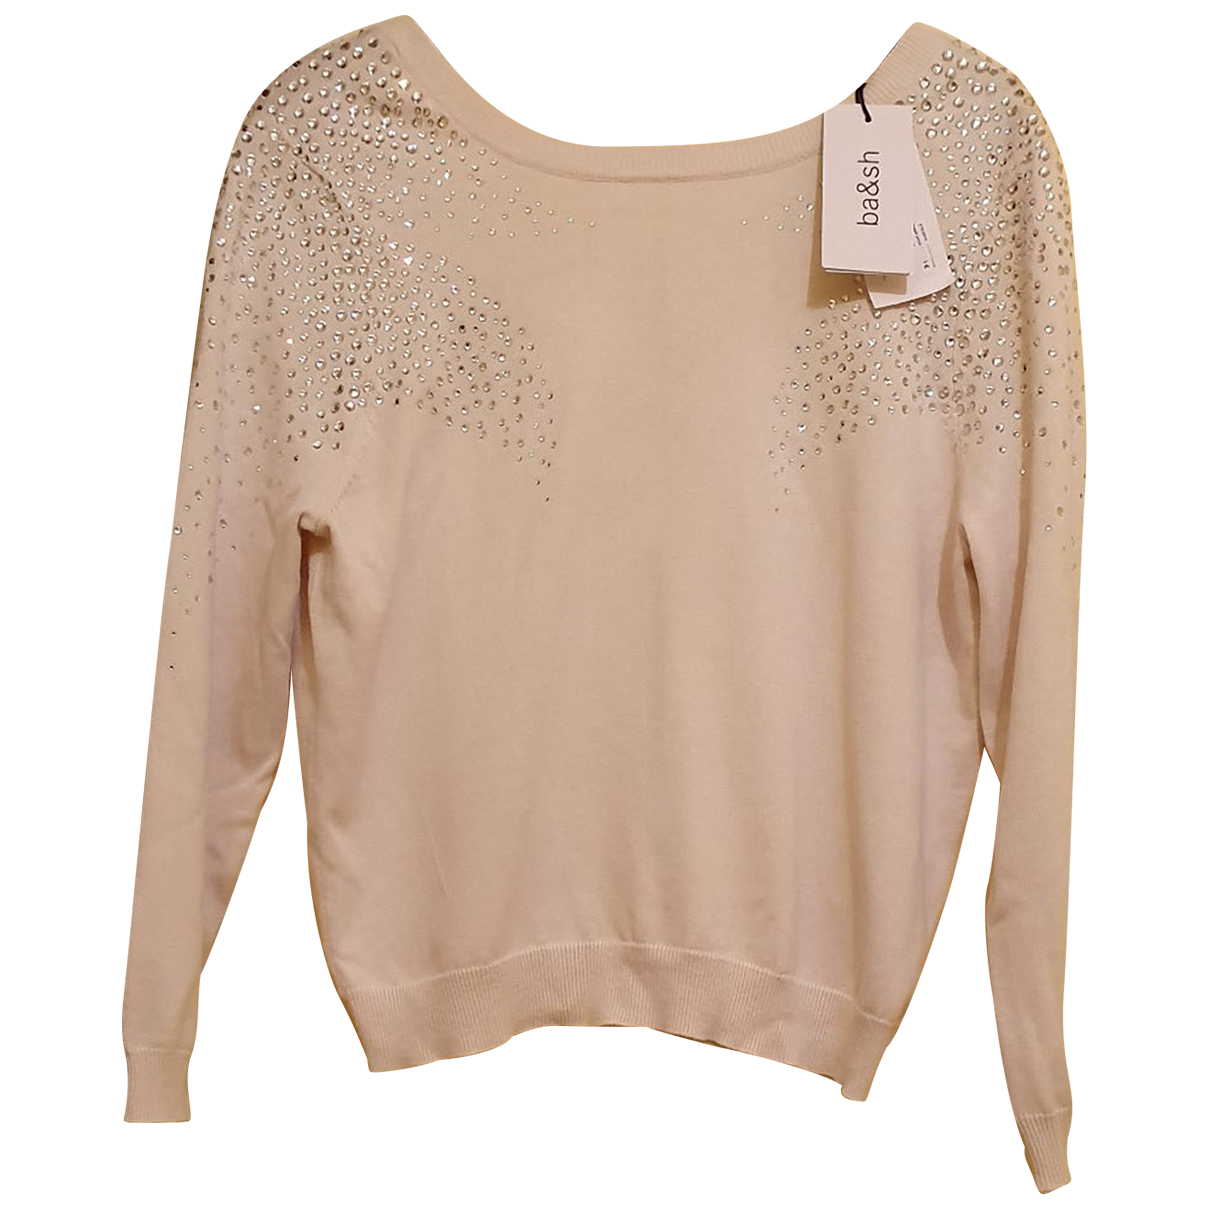 Ba&sh Fall Winter 2019 Ecru Cotton Knitwear for Women 36 FR